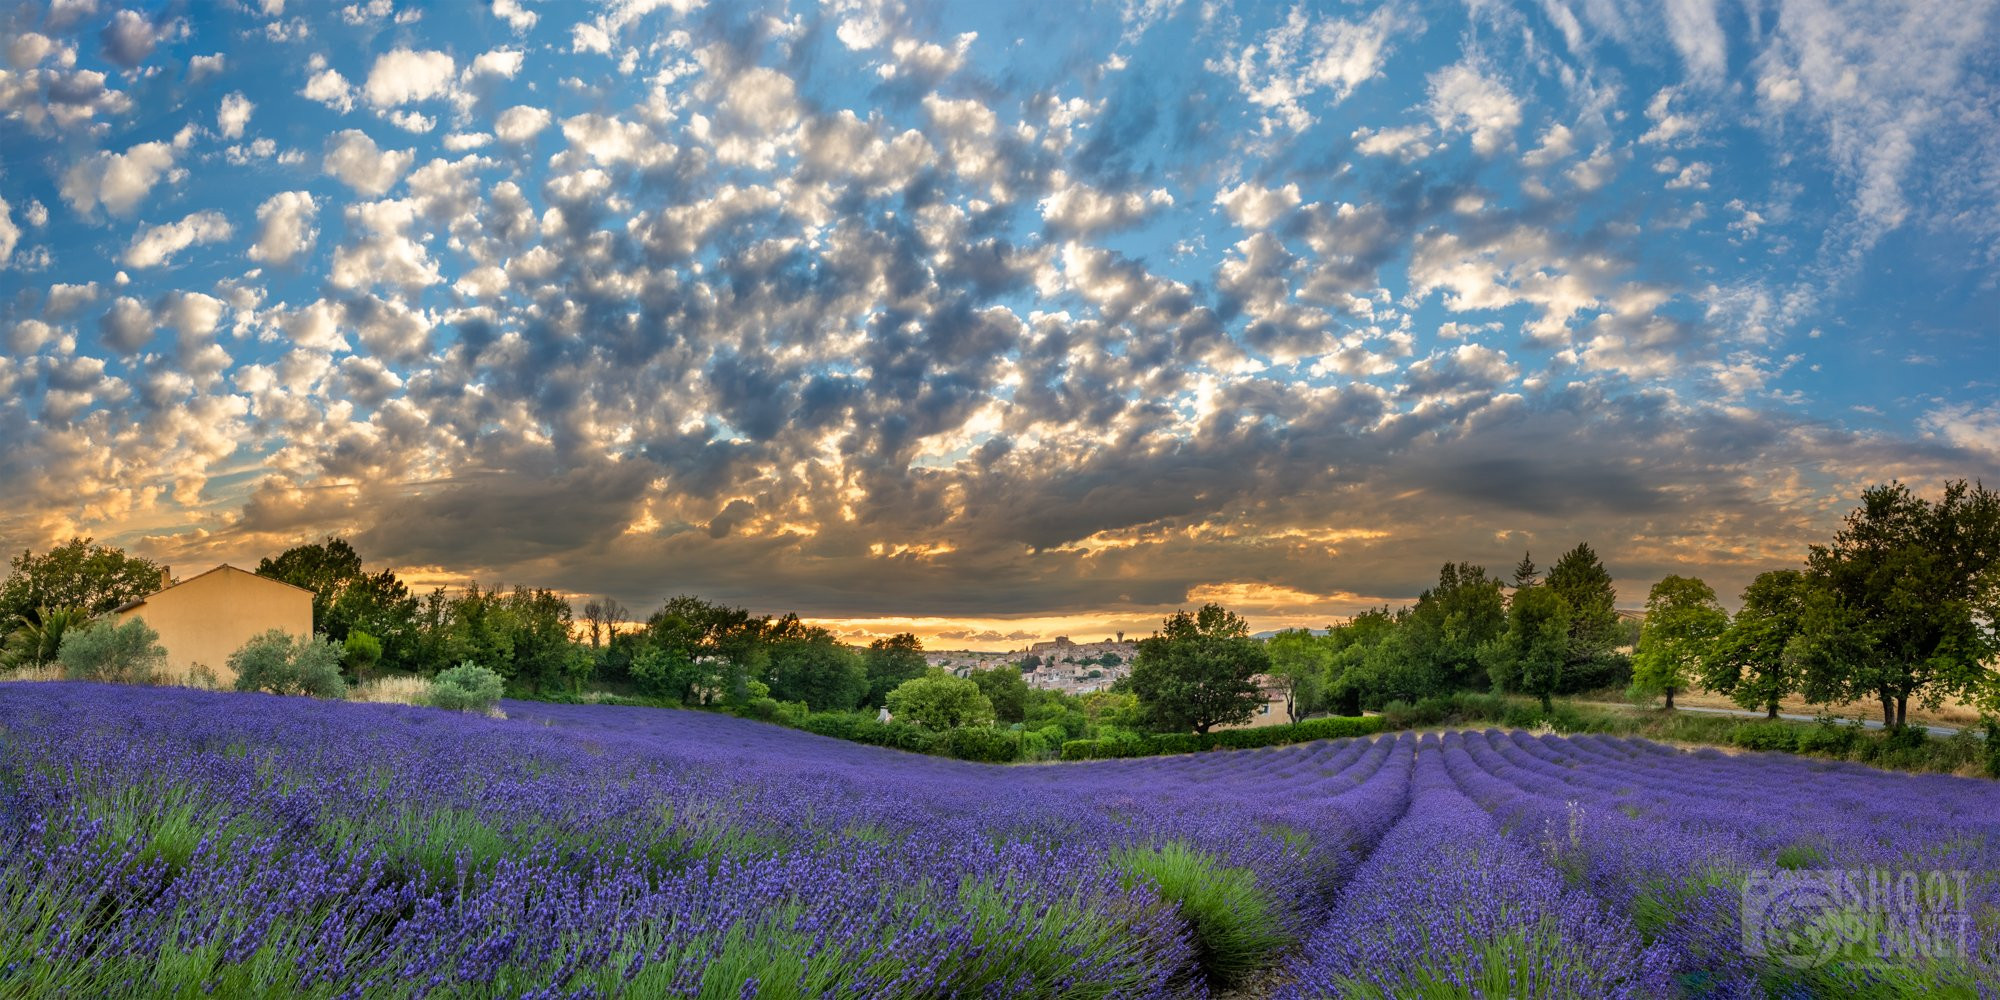 Valensole Provençal village lavenders fields sunrise, France